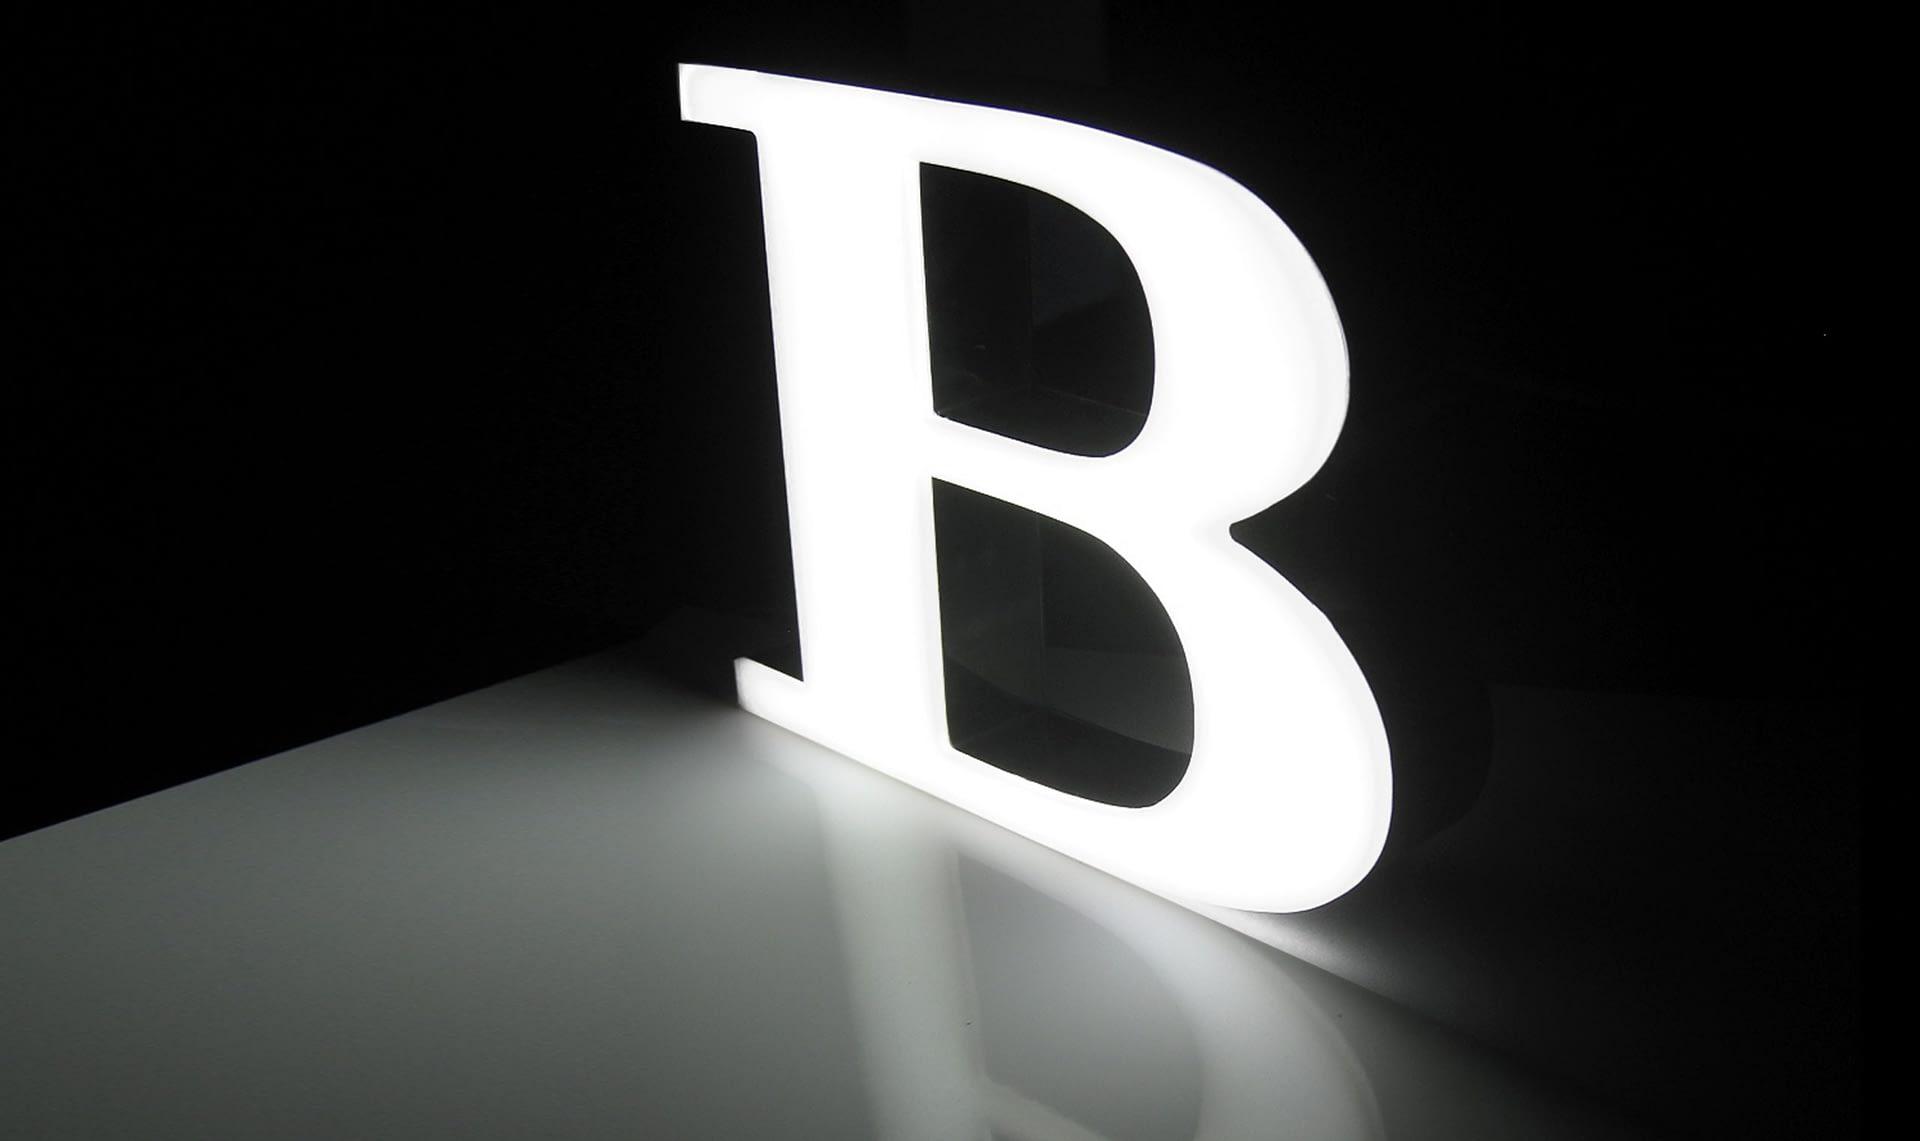 LED lightbox caja luz logo letra actilum